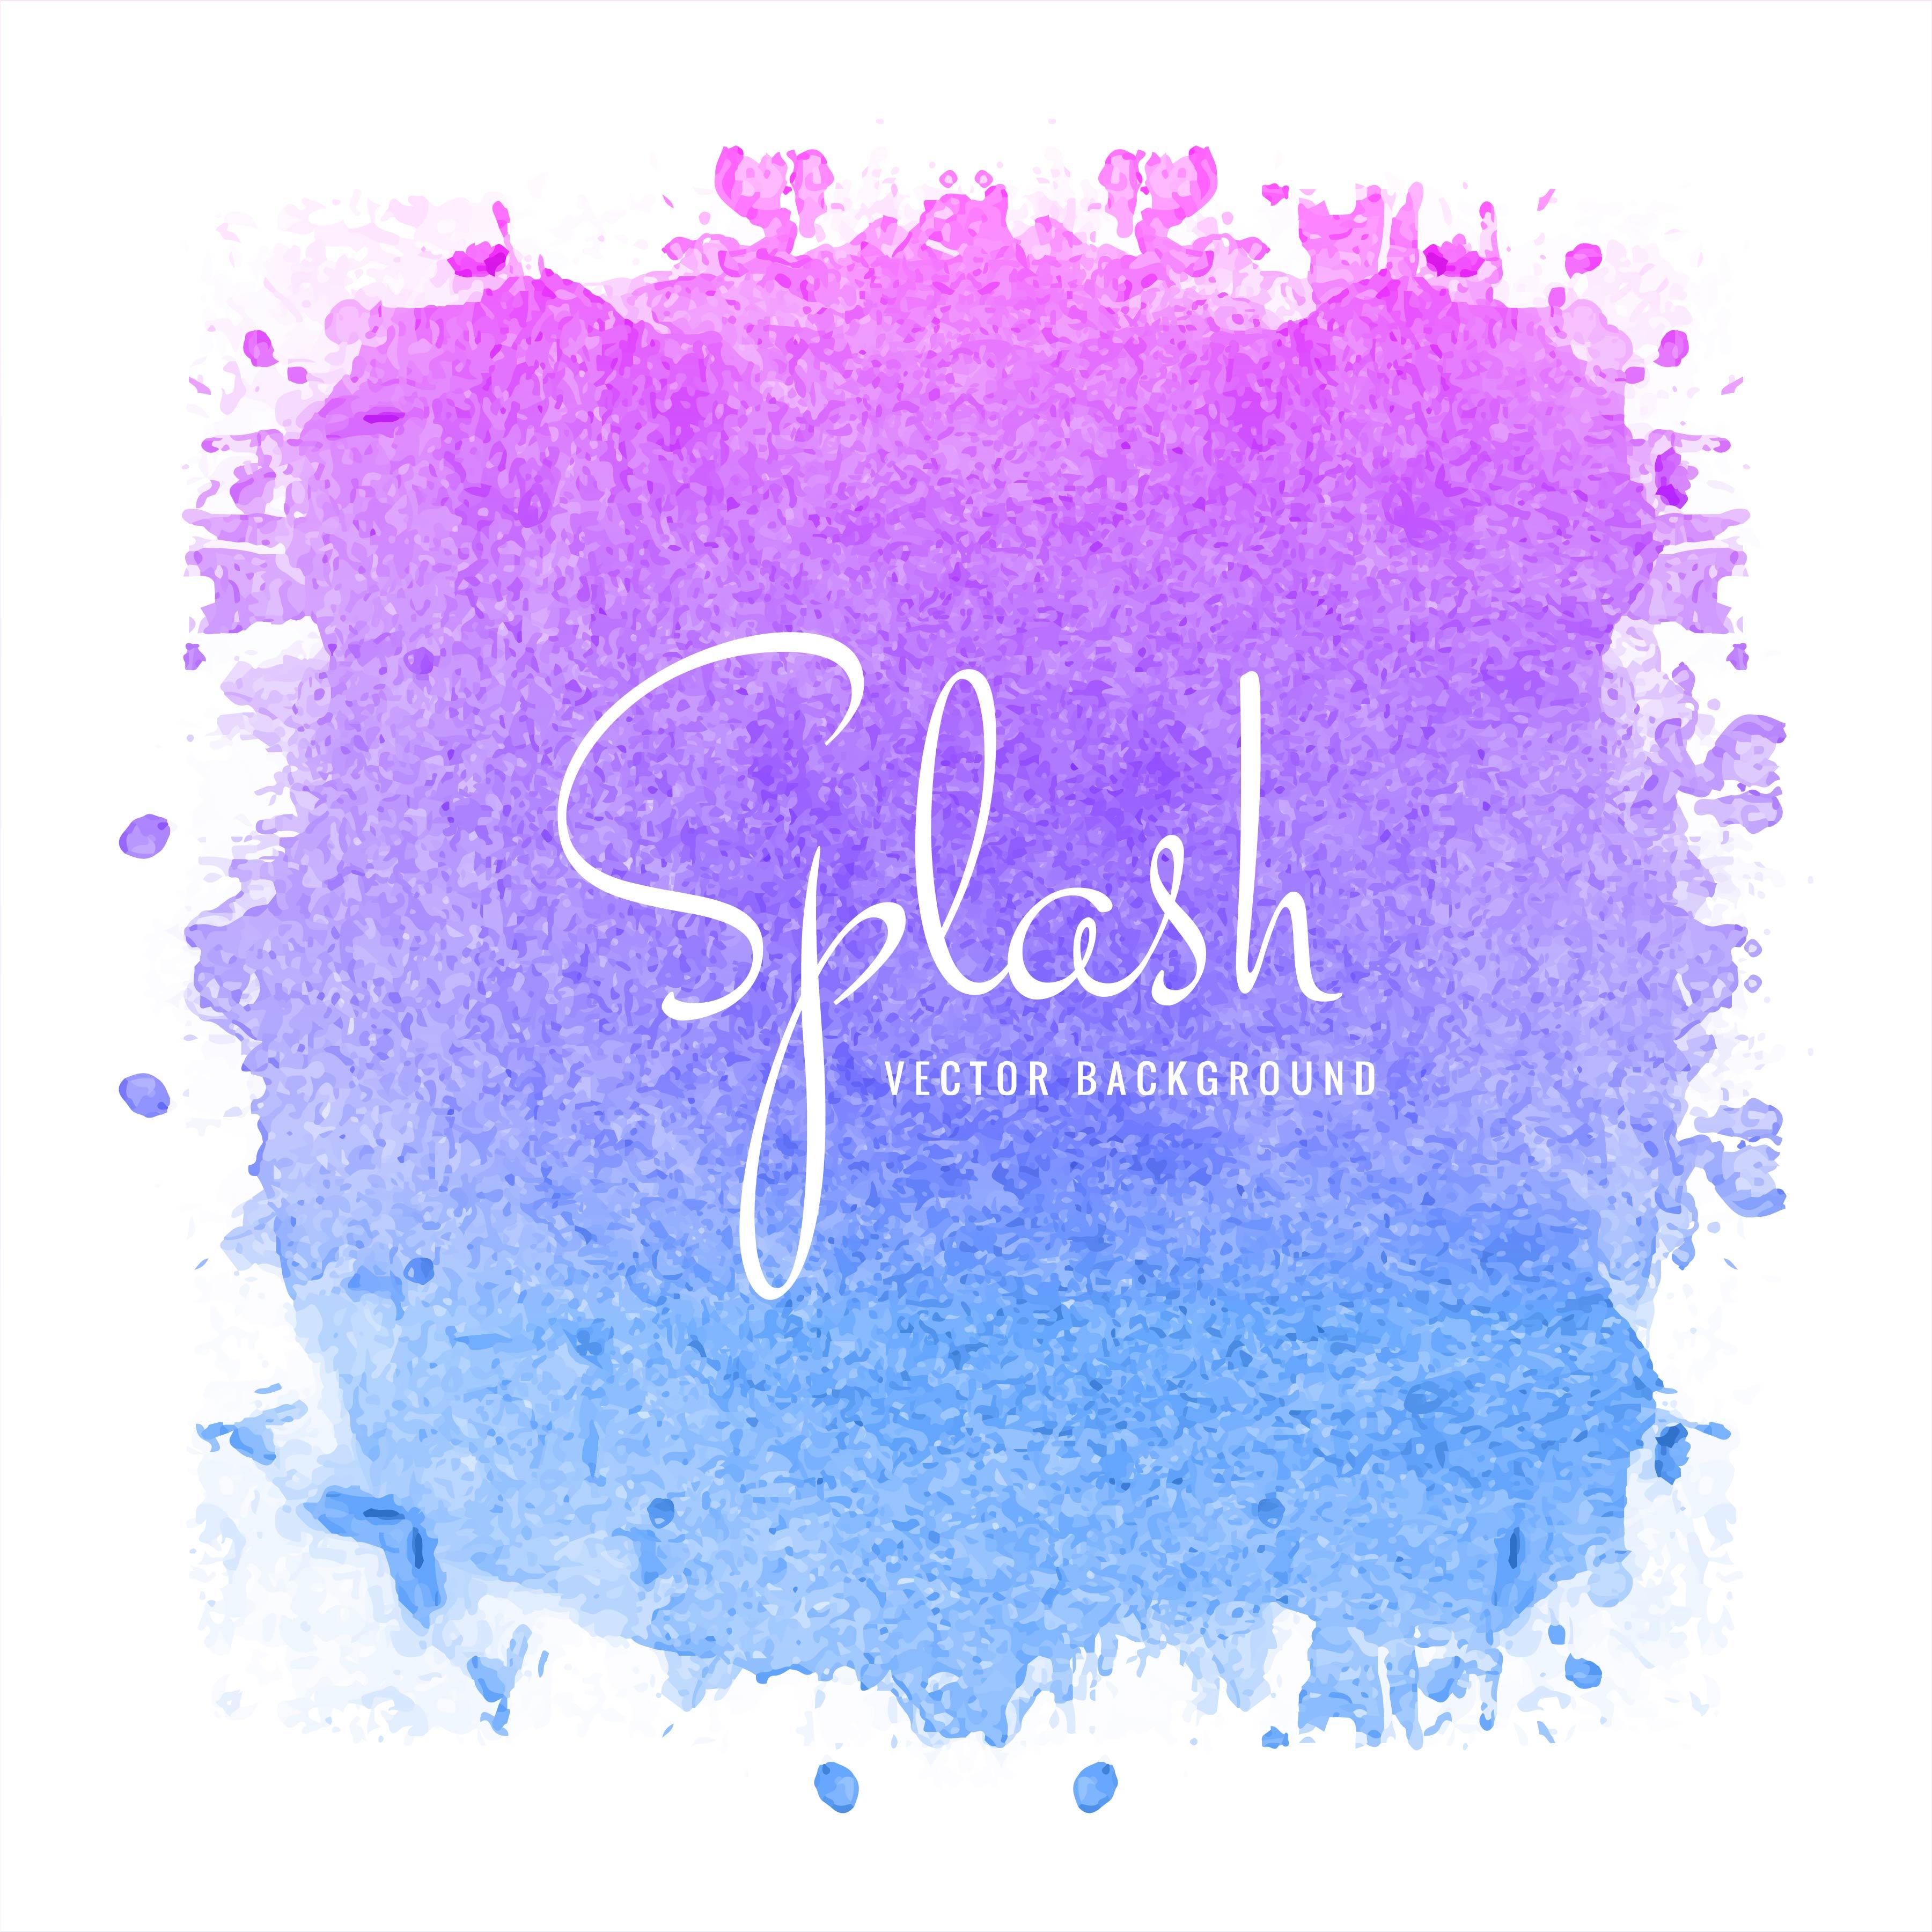 Colorful Watercolor Splash White Background Stock Photo ...  Colorful Watercolor Splash